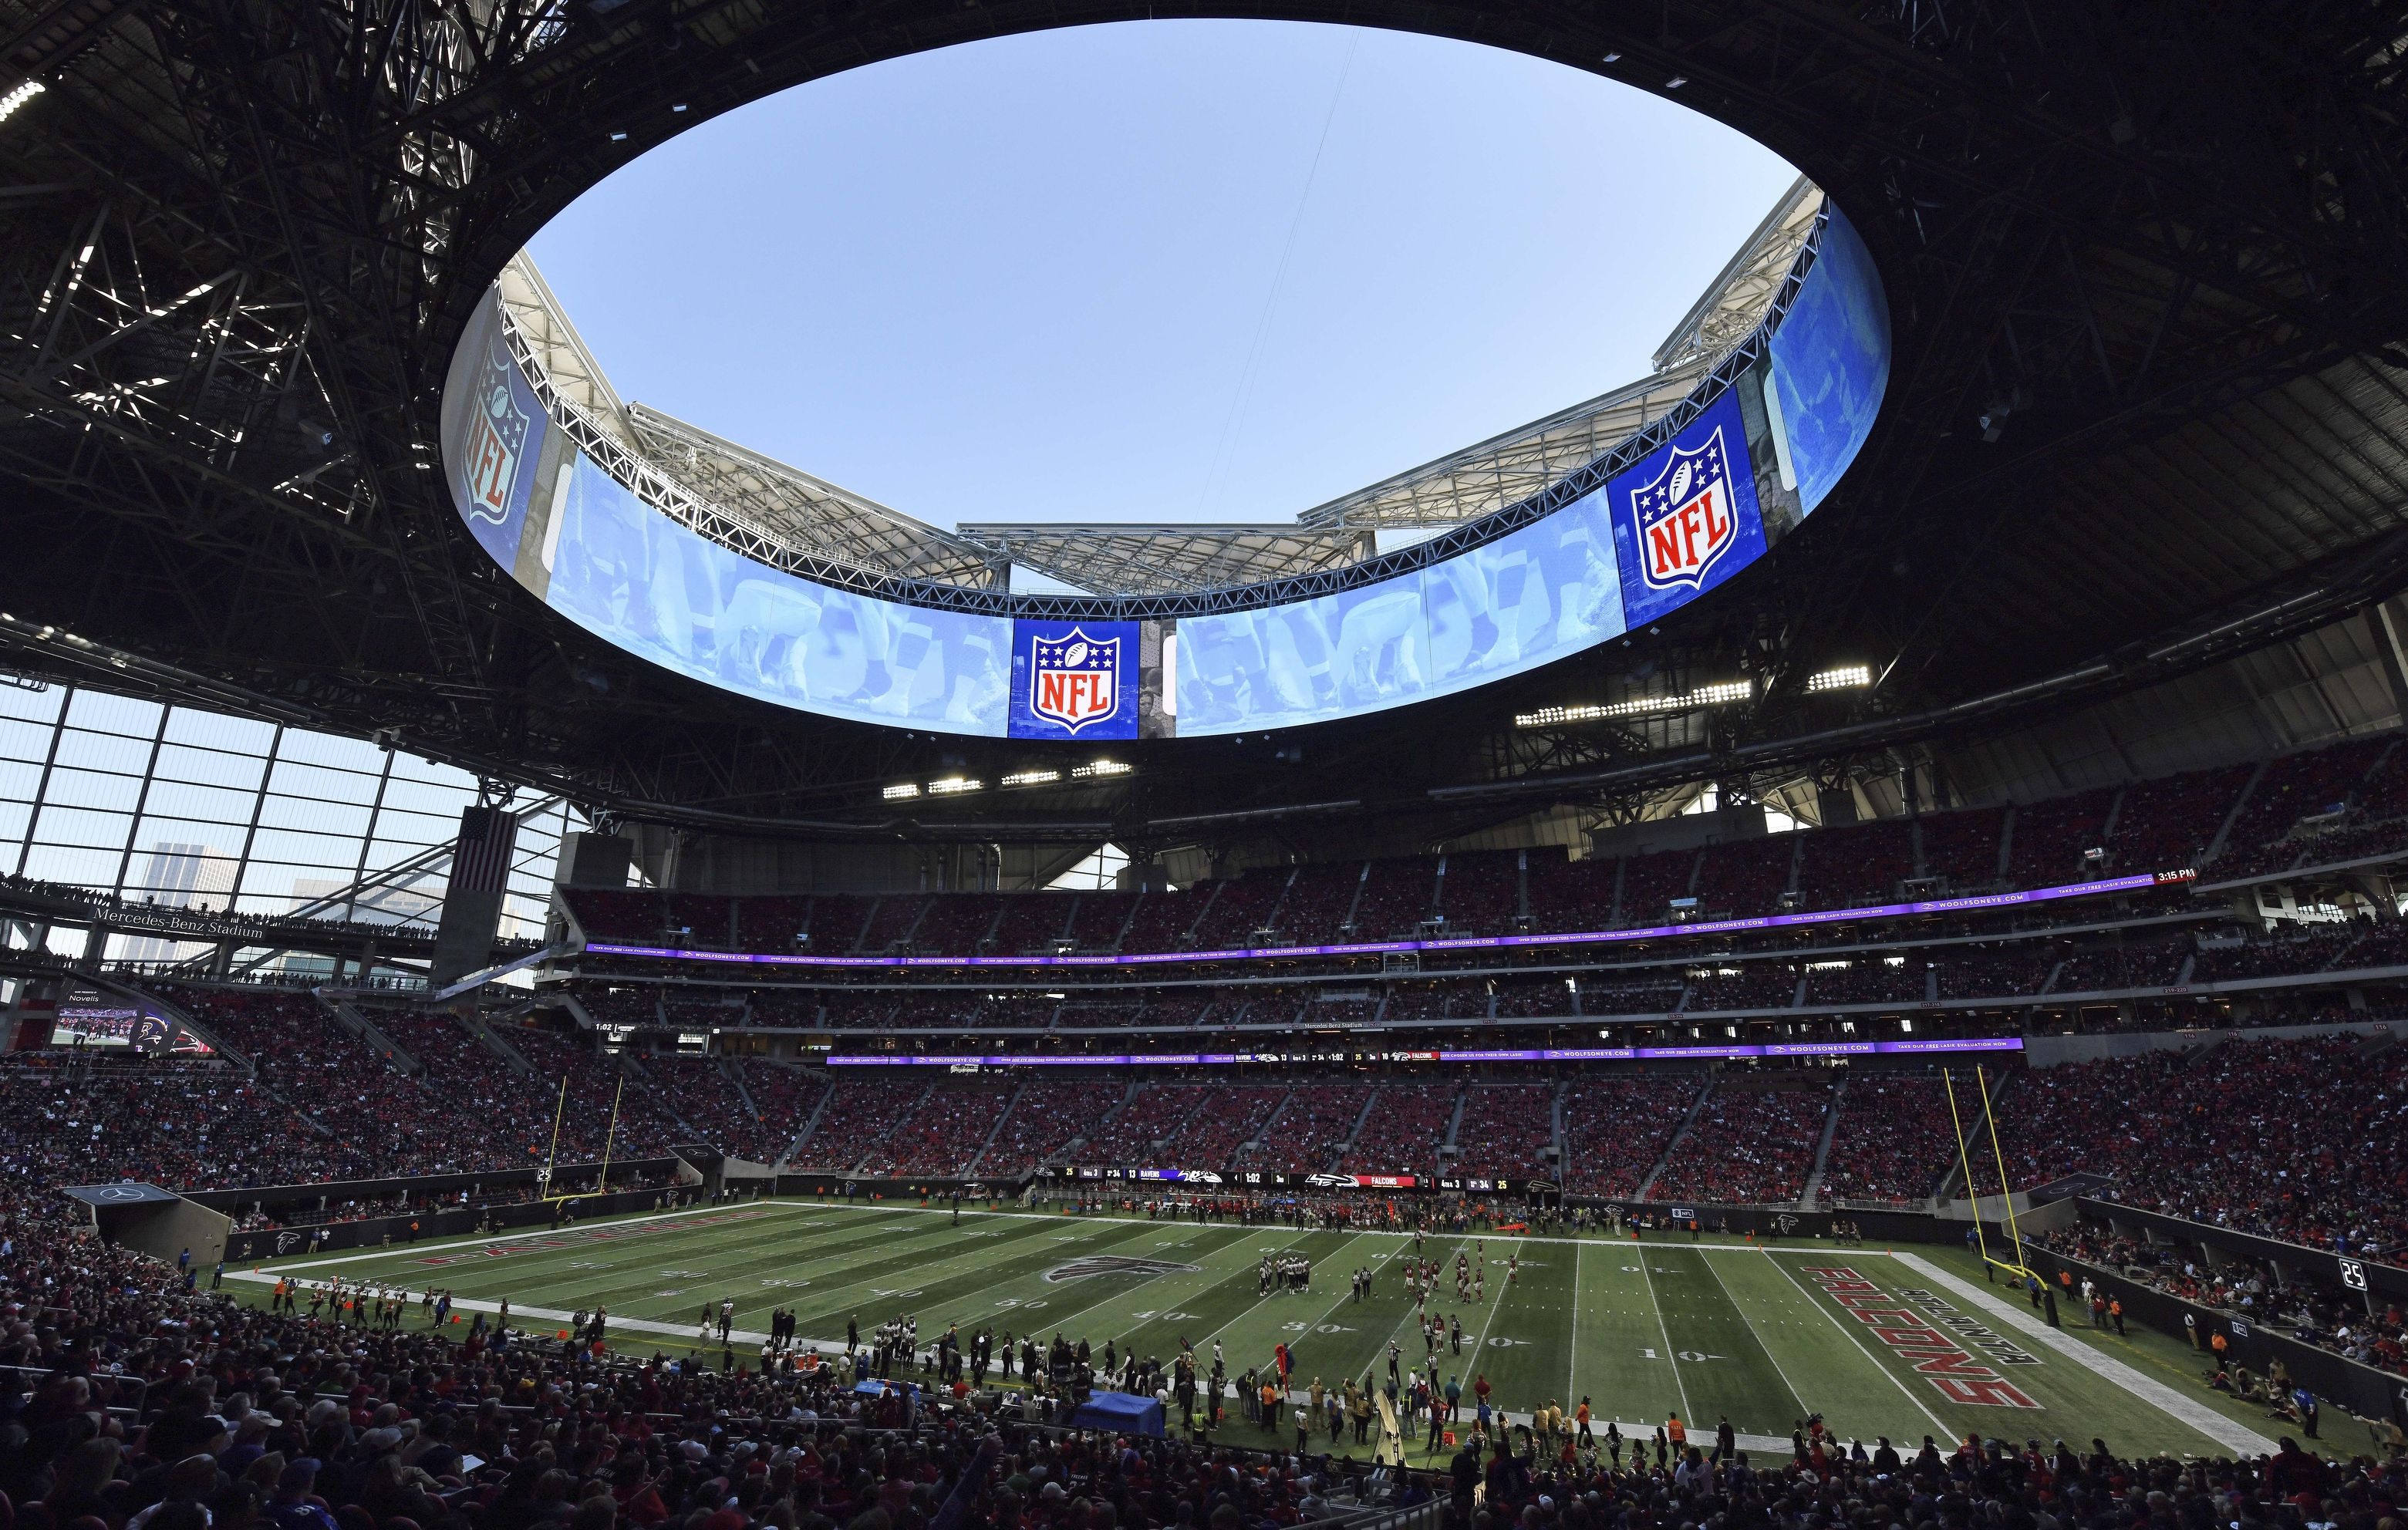 Super Bowl 2019 Will Mercedes Benz Stadium Roof Be Open For Patriots Vs Rams Weather Forecast Super Bowl 53 Nj Com